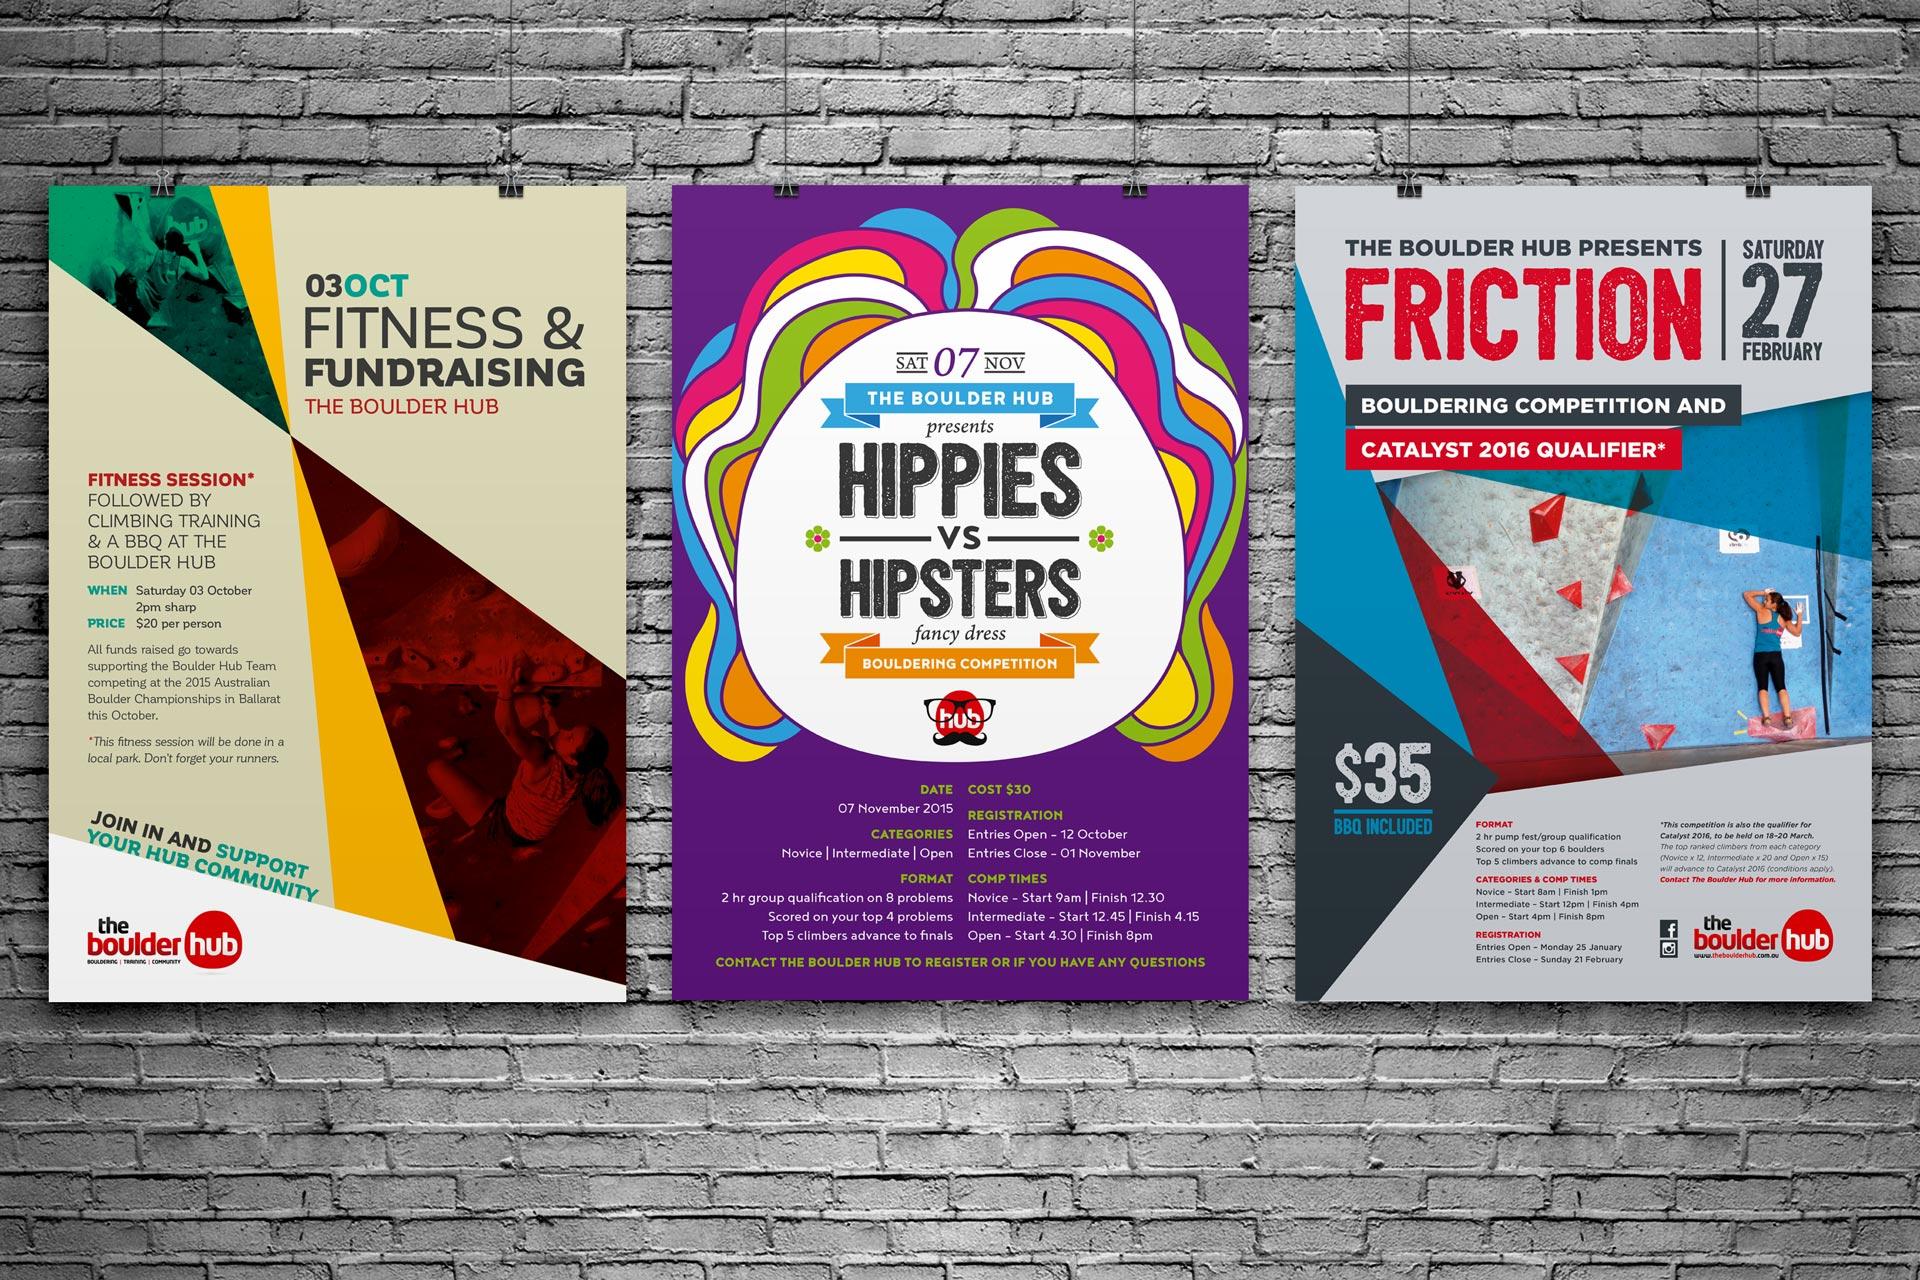 poster-climbing-bouldering-hippie-hipster-hub